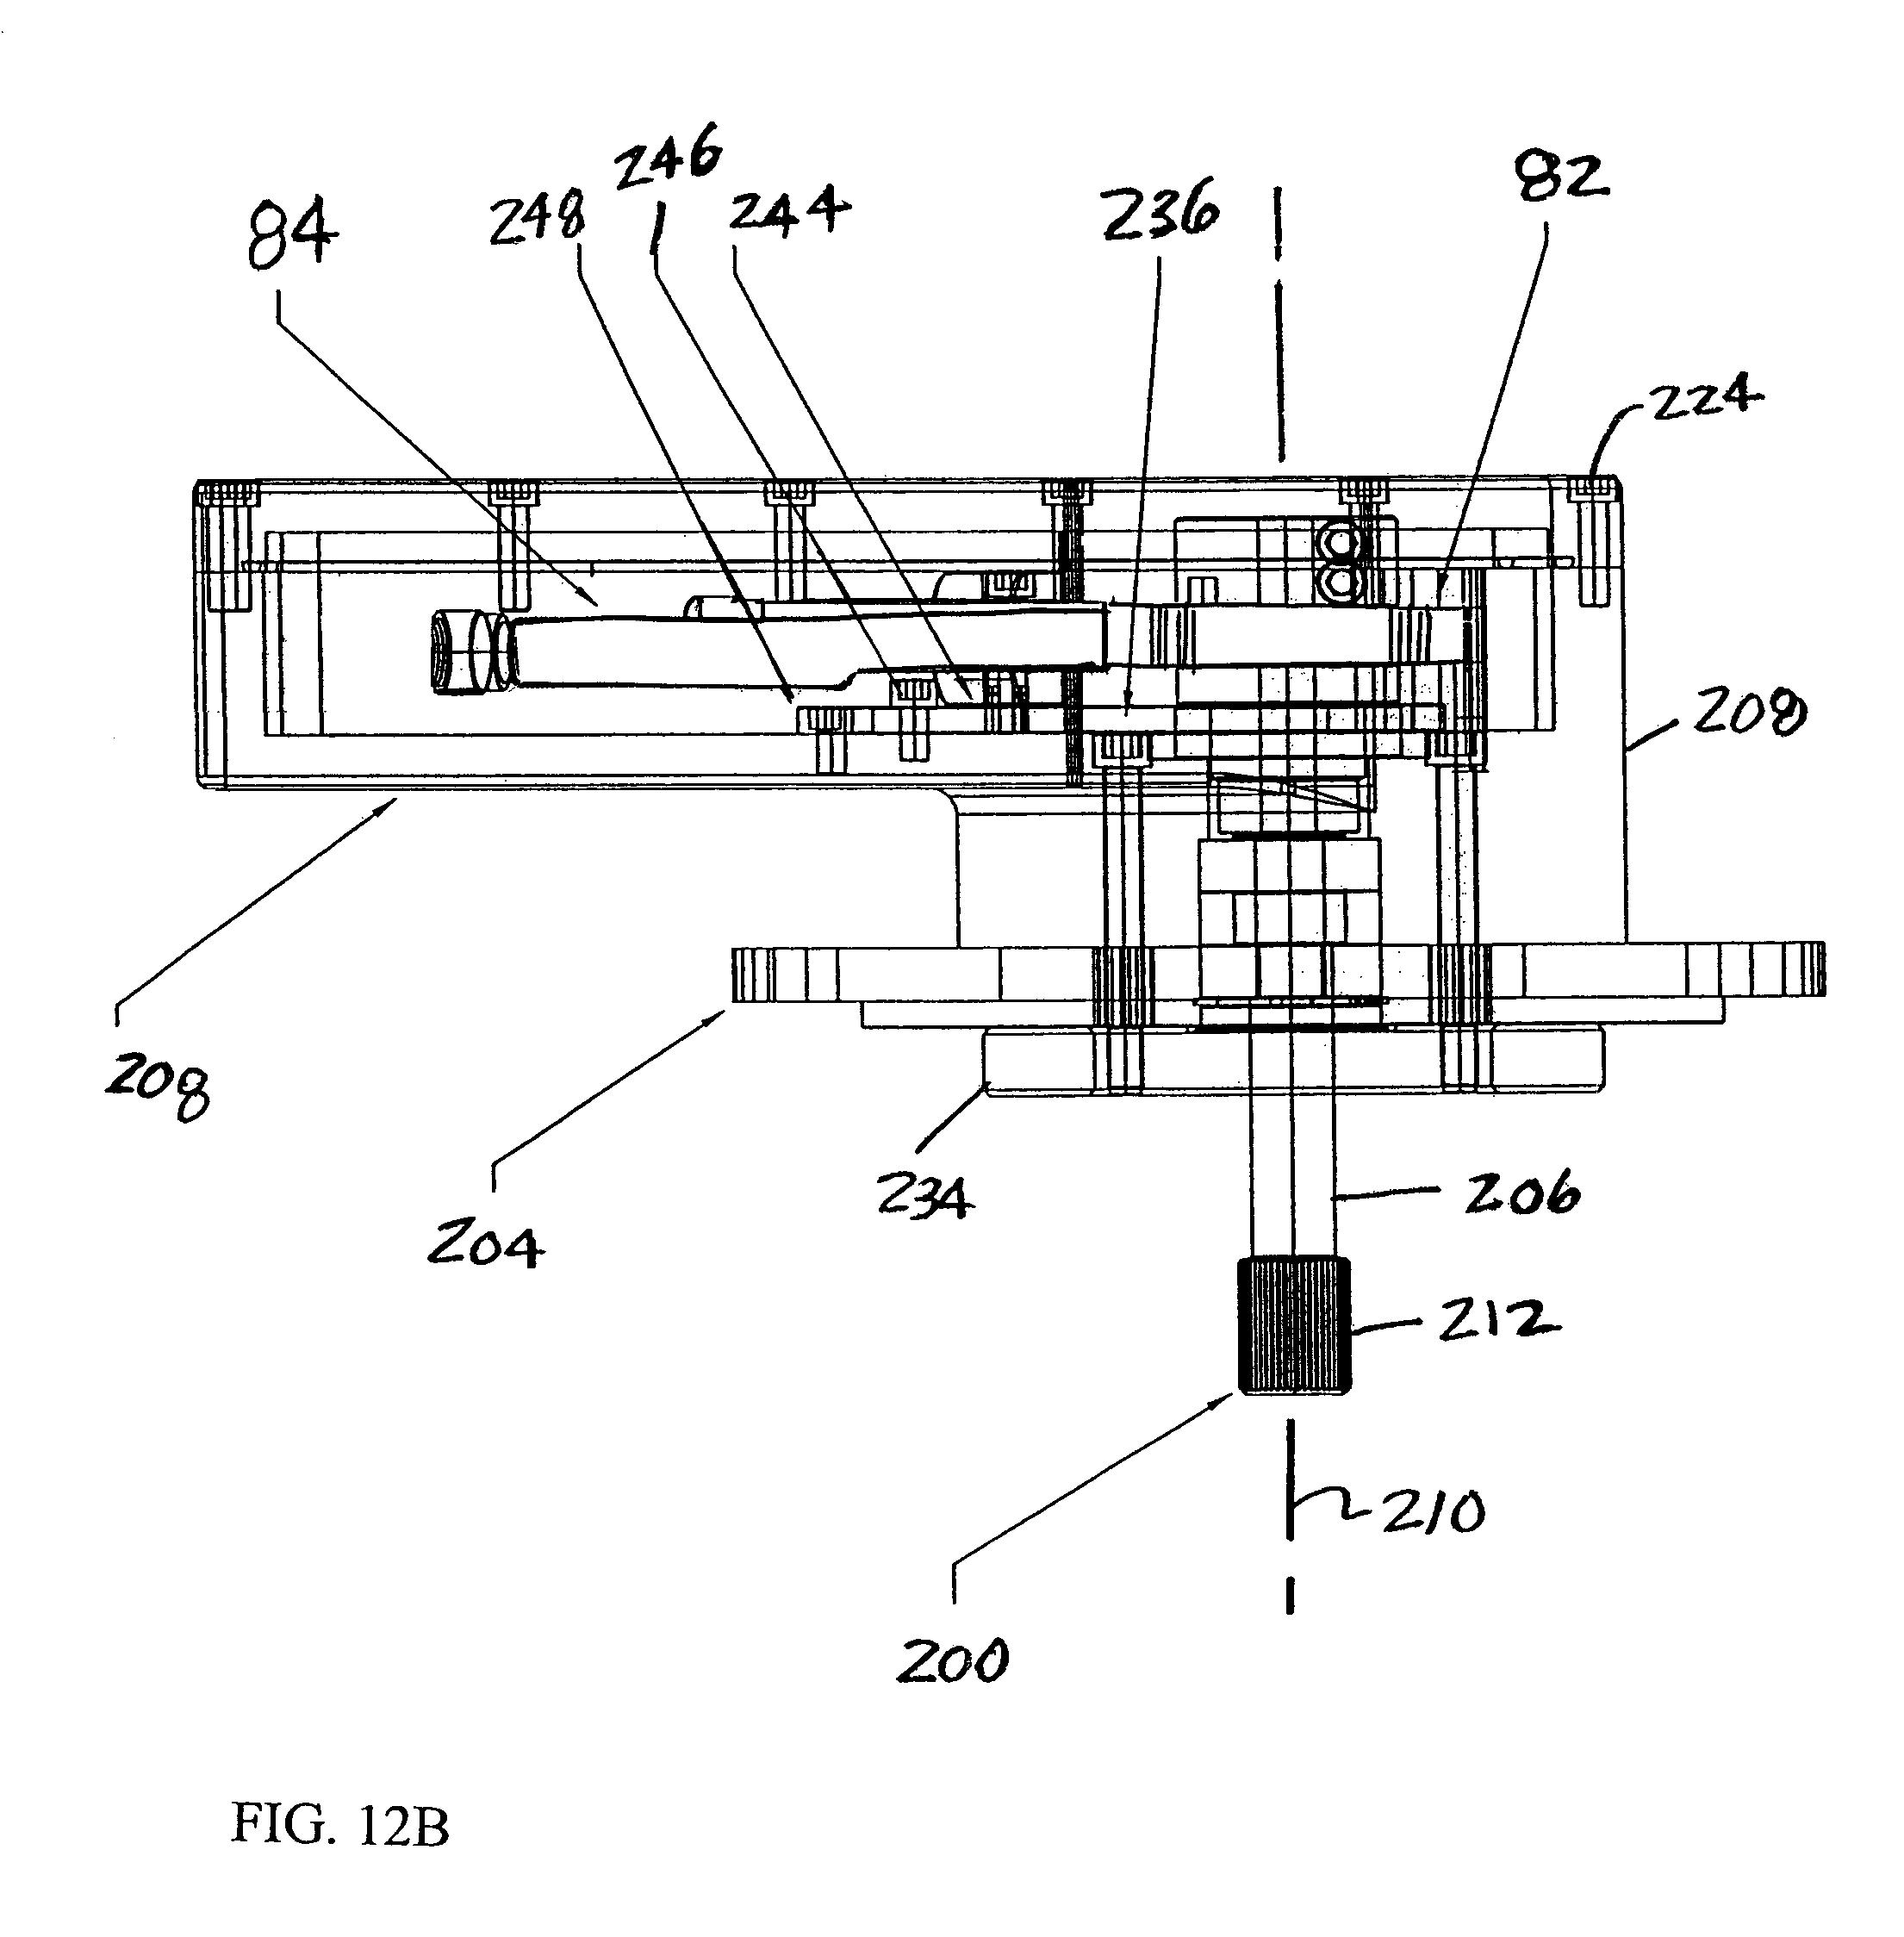 3516 caterpillar wiring diagrams